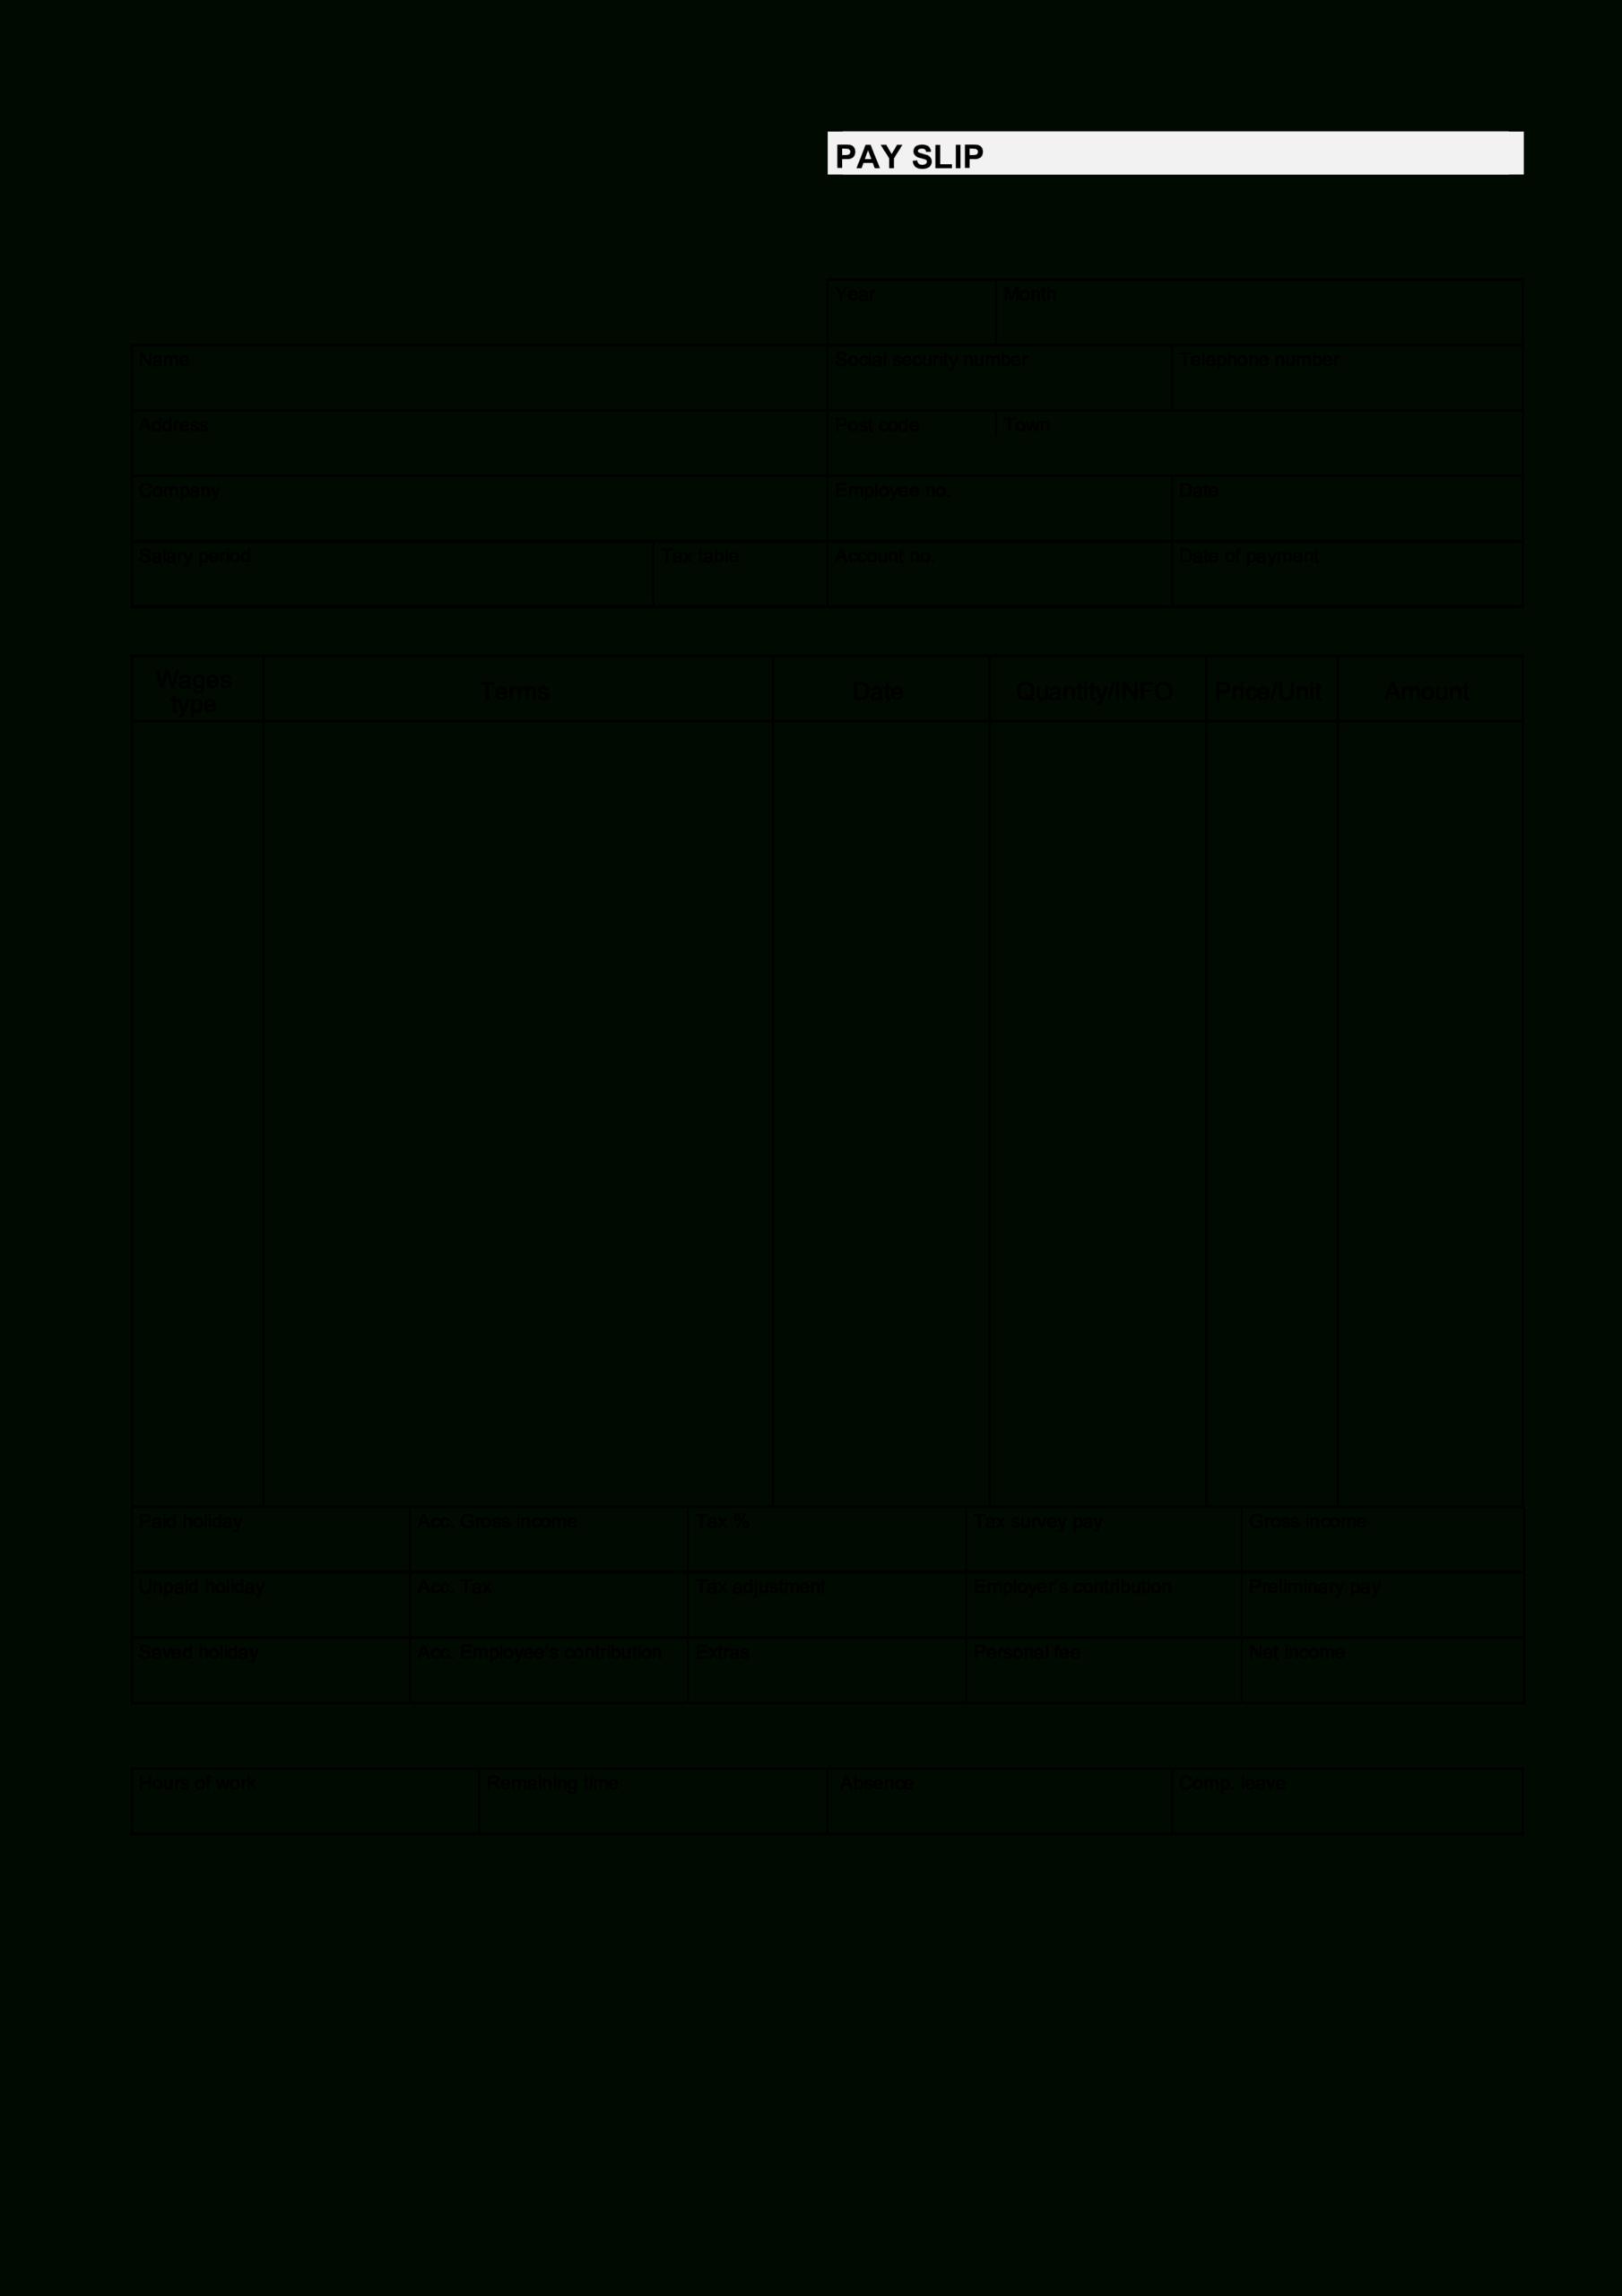 Blank Pay Stub Printable | Templates At Allbusinesstemplates With Blank Pay Stubs Template